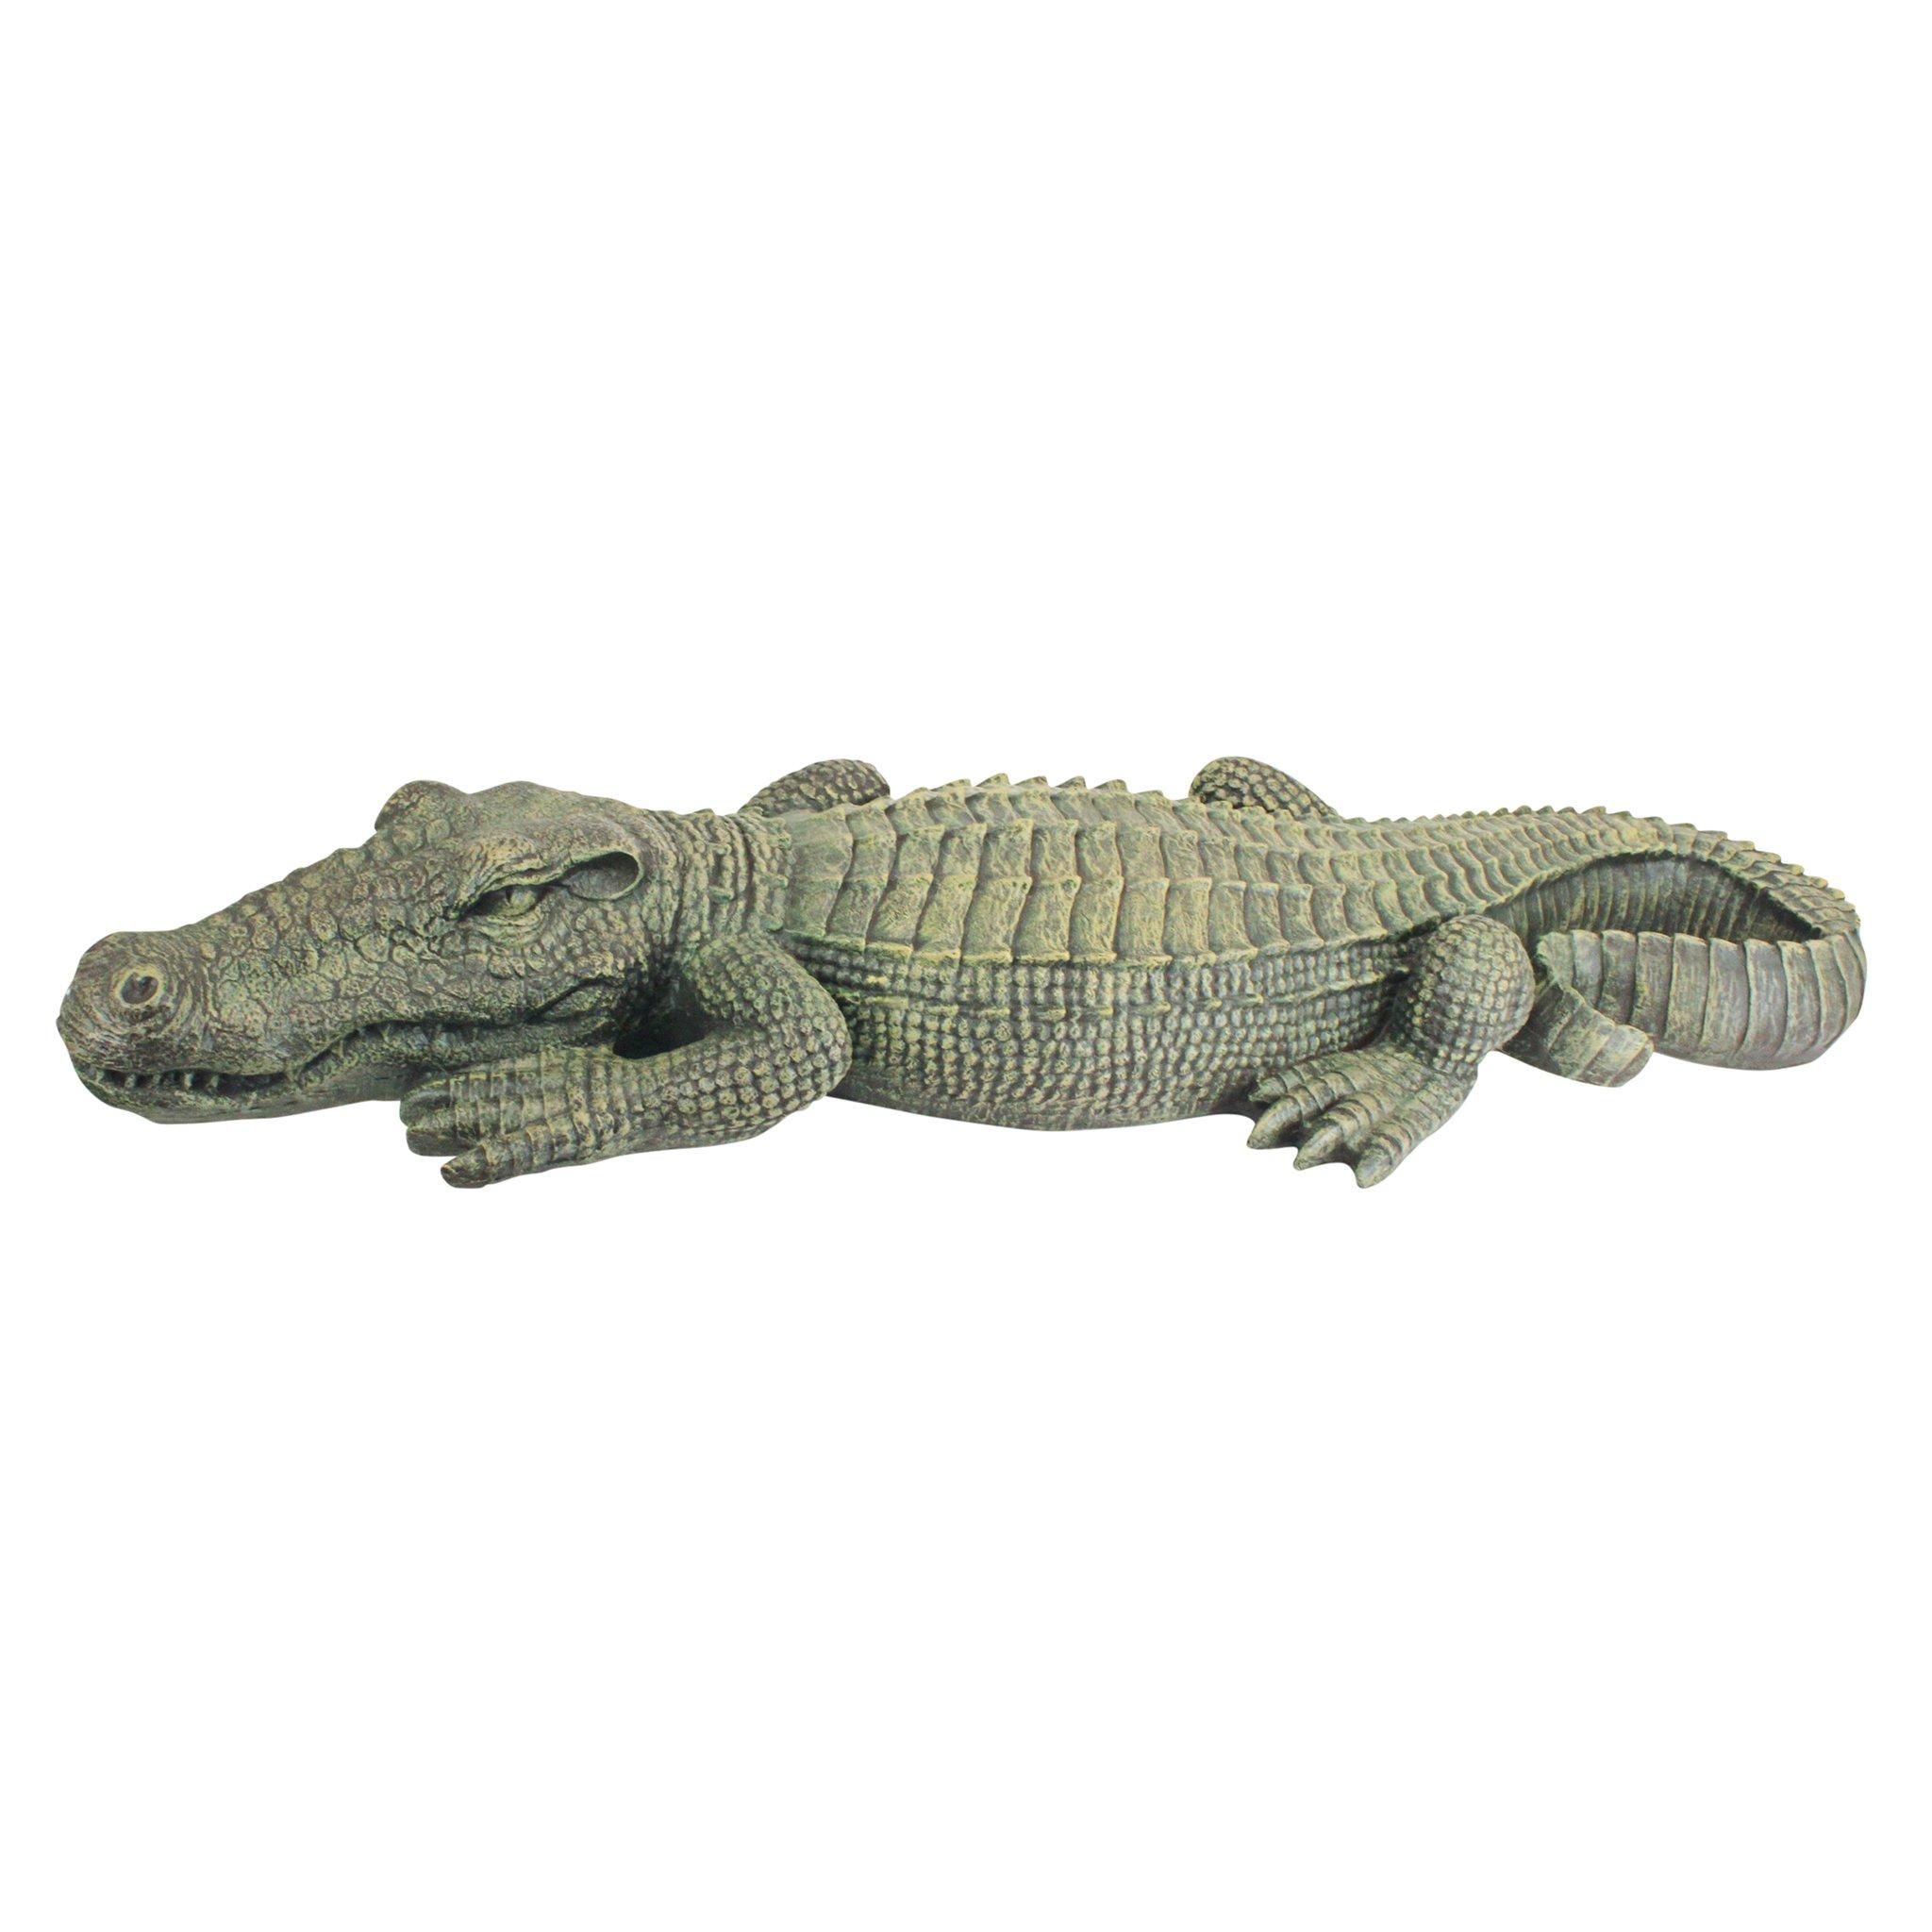 Design Toscano The Swamp Beast Lawn Alligator Crocodile Garden Sculpture, 37 Inch, Polyresin, Full Color by Design Toscano (Image #2)